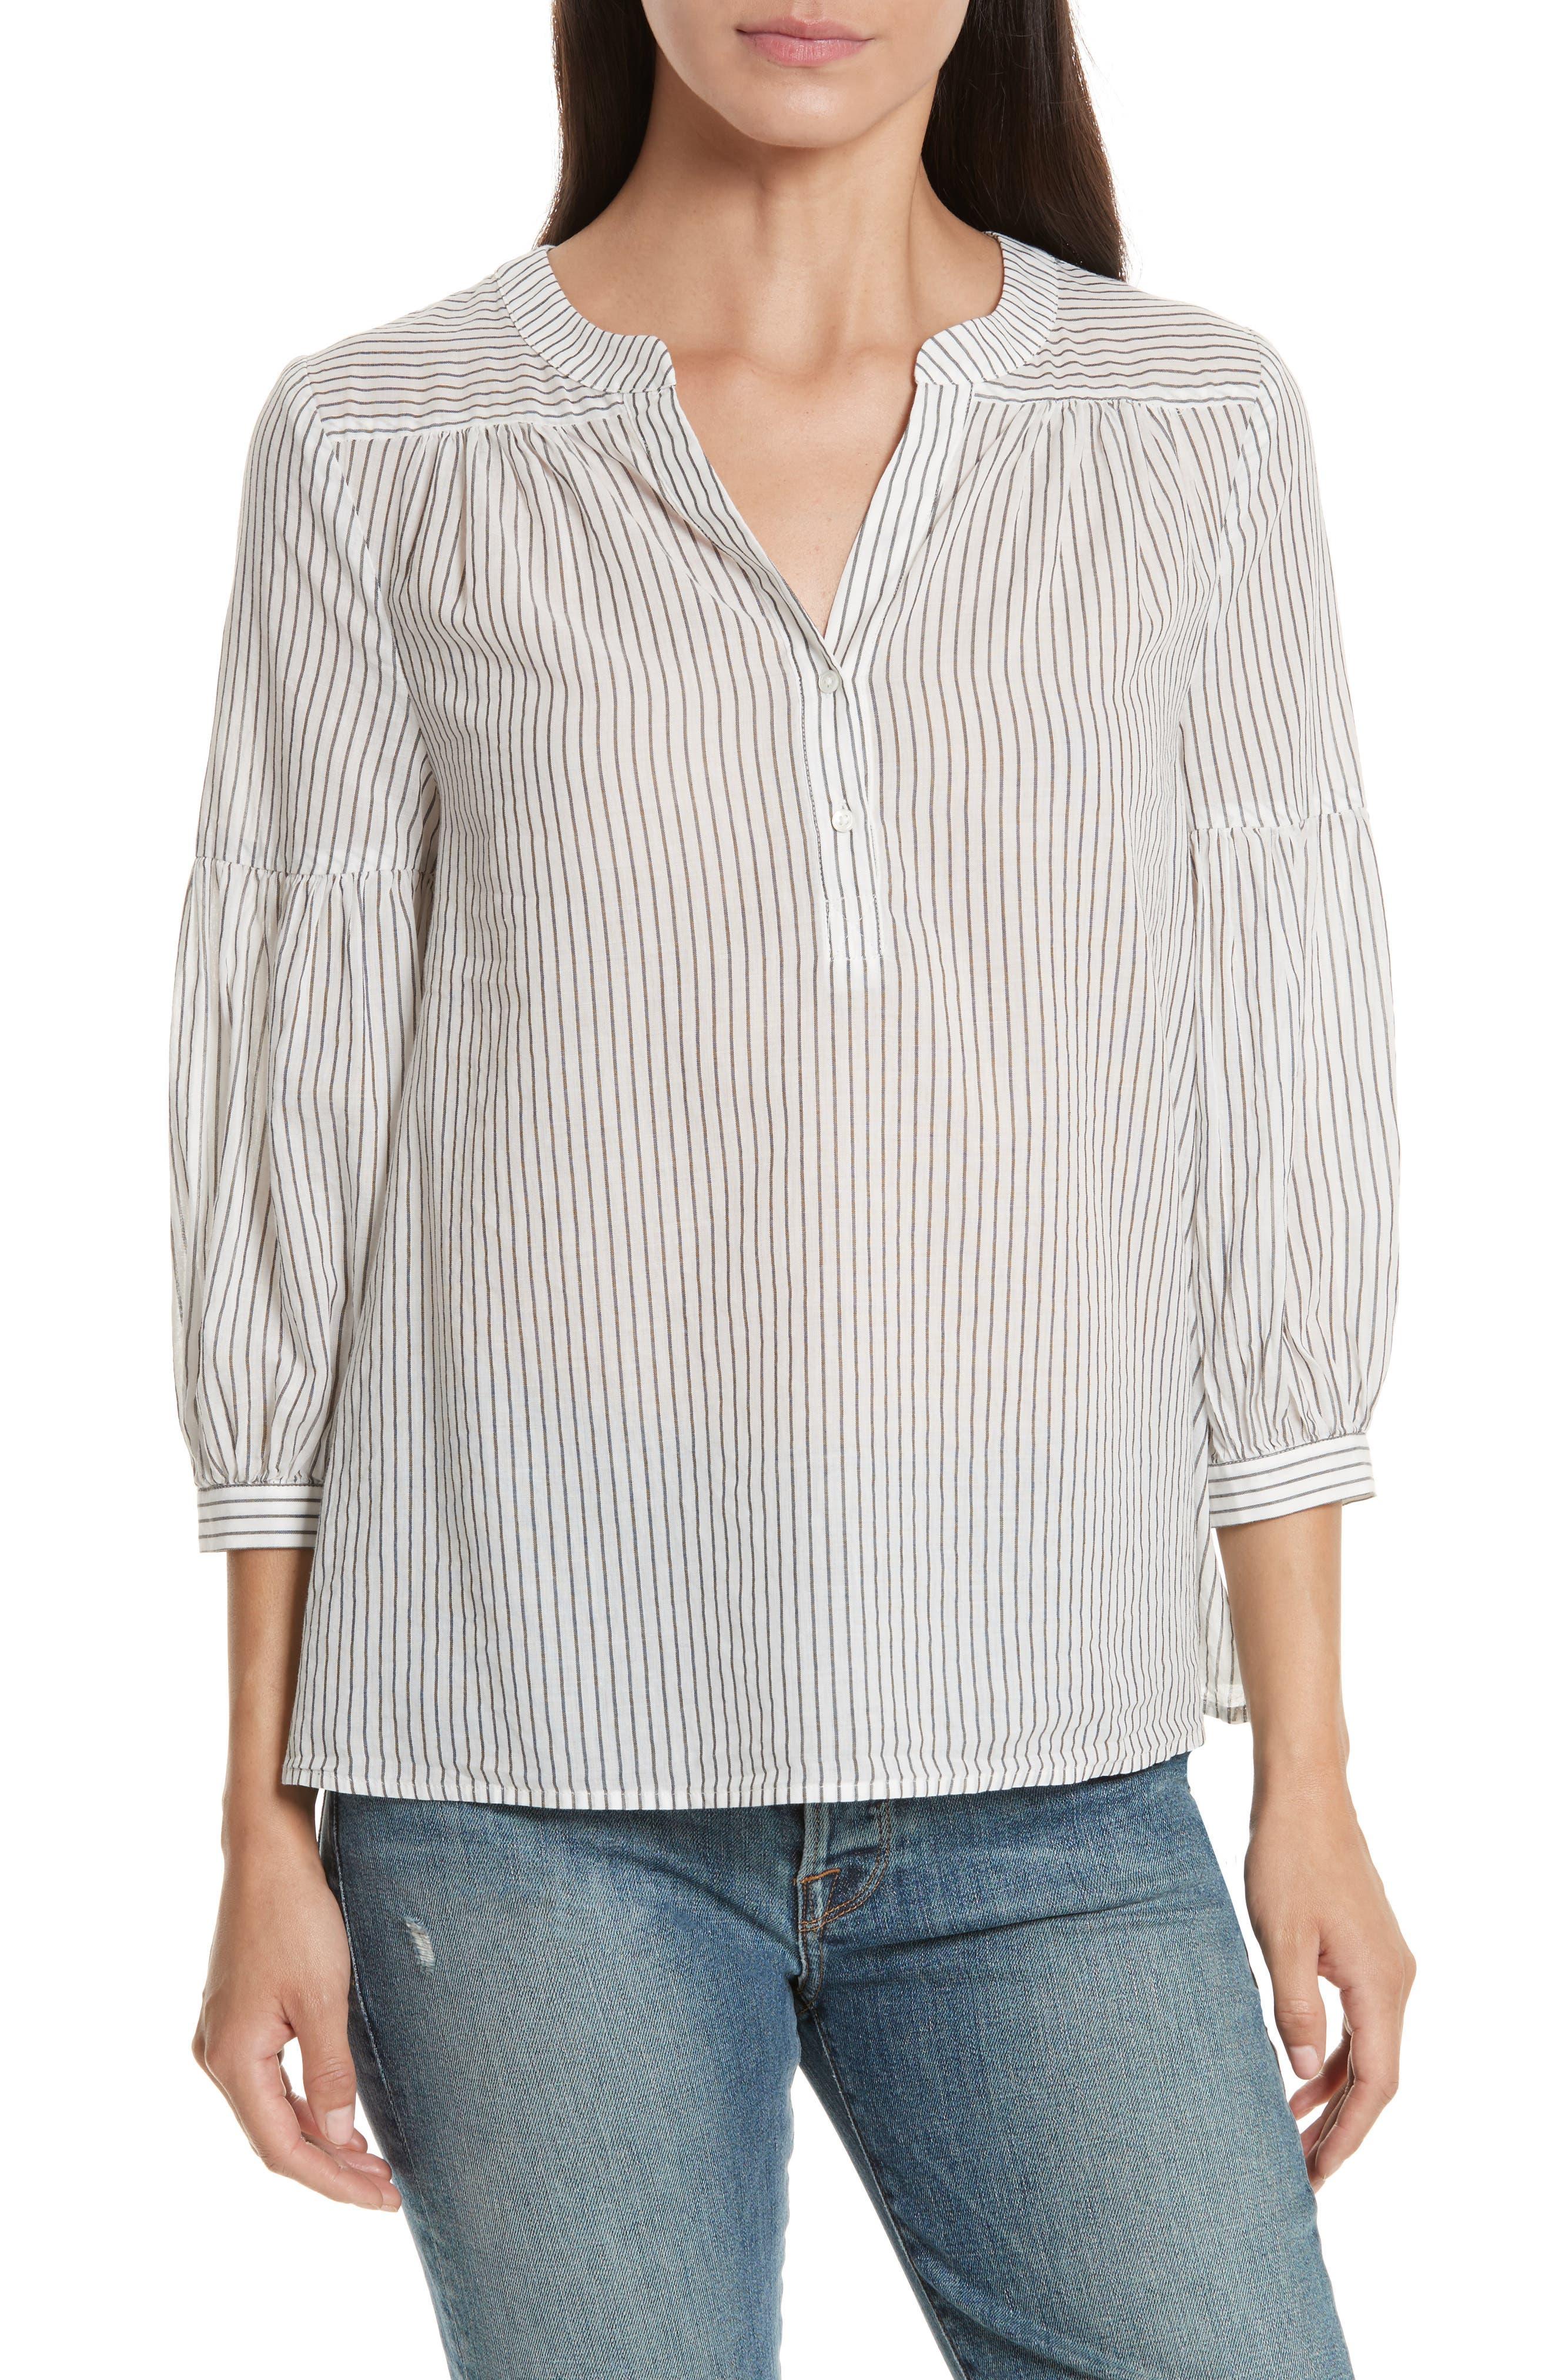 Alternate Image 1 Selected - Joie Aldys Stripe Cotton Top